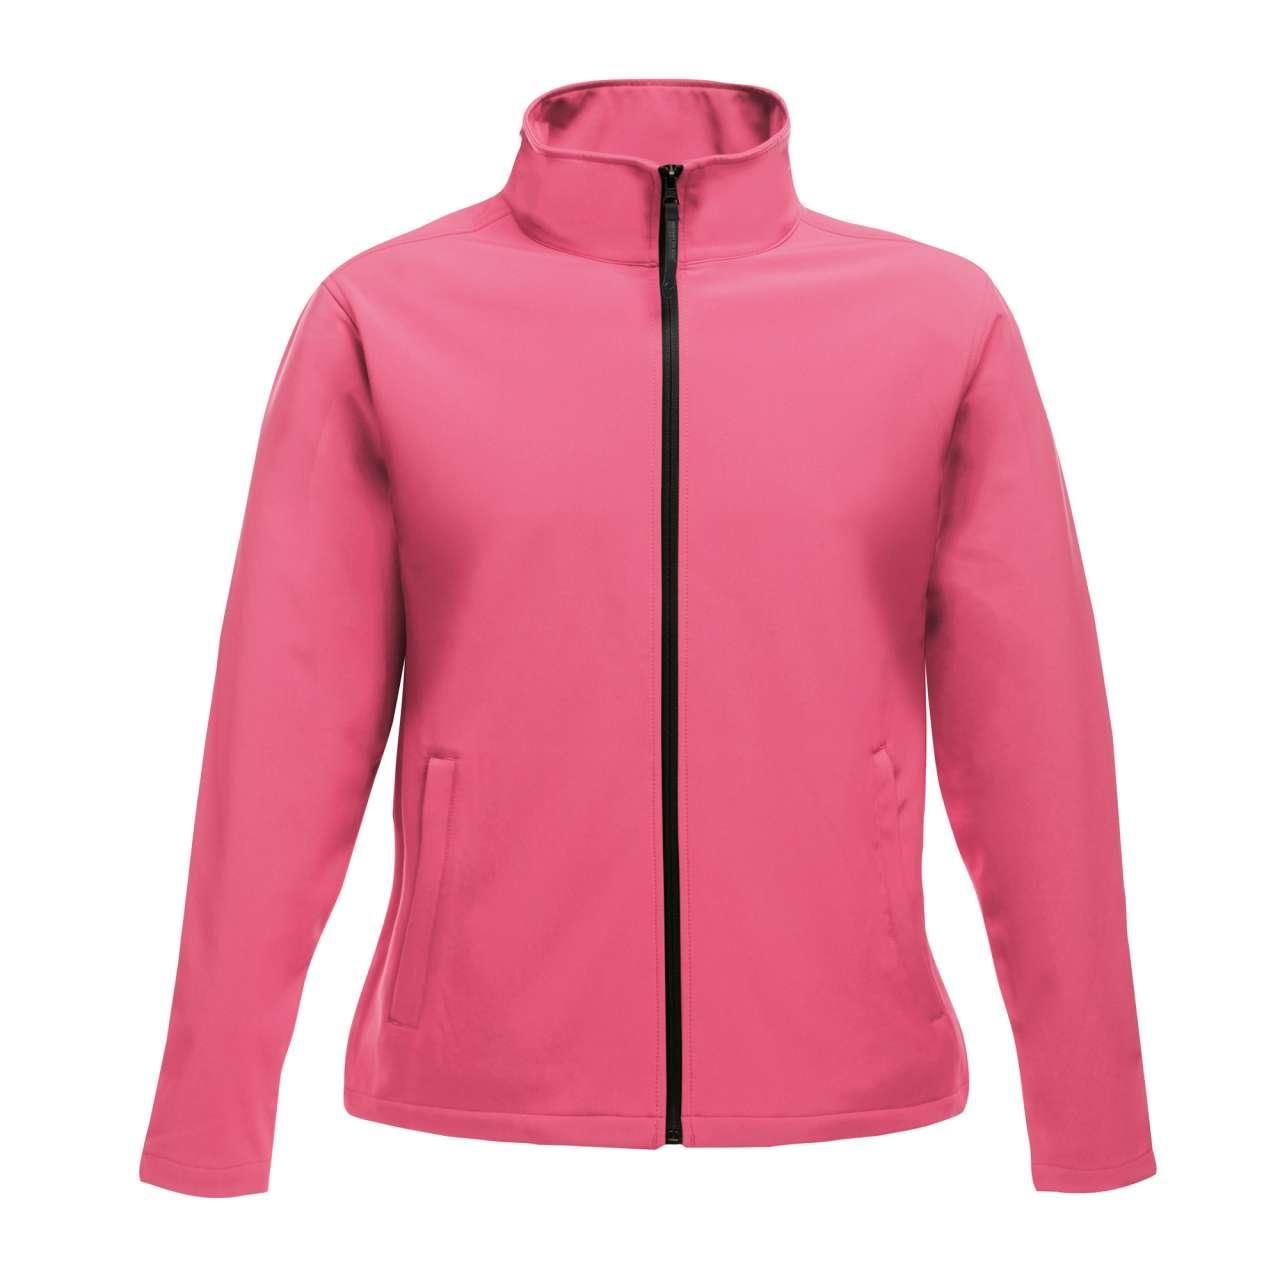 Softshell RETRA629 roz Veste jachete dama barbatesti polar fleece softshell fas gluga ploaie vant broderie serigrafie termotransfer